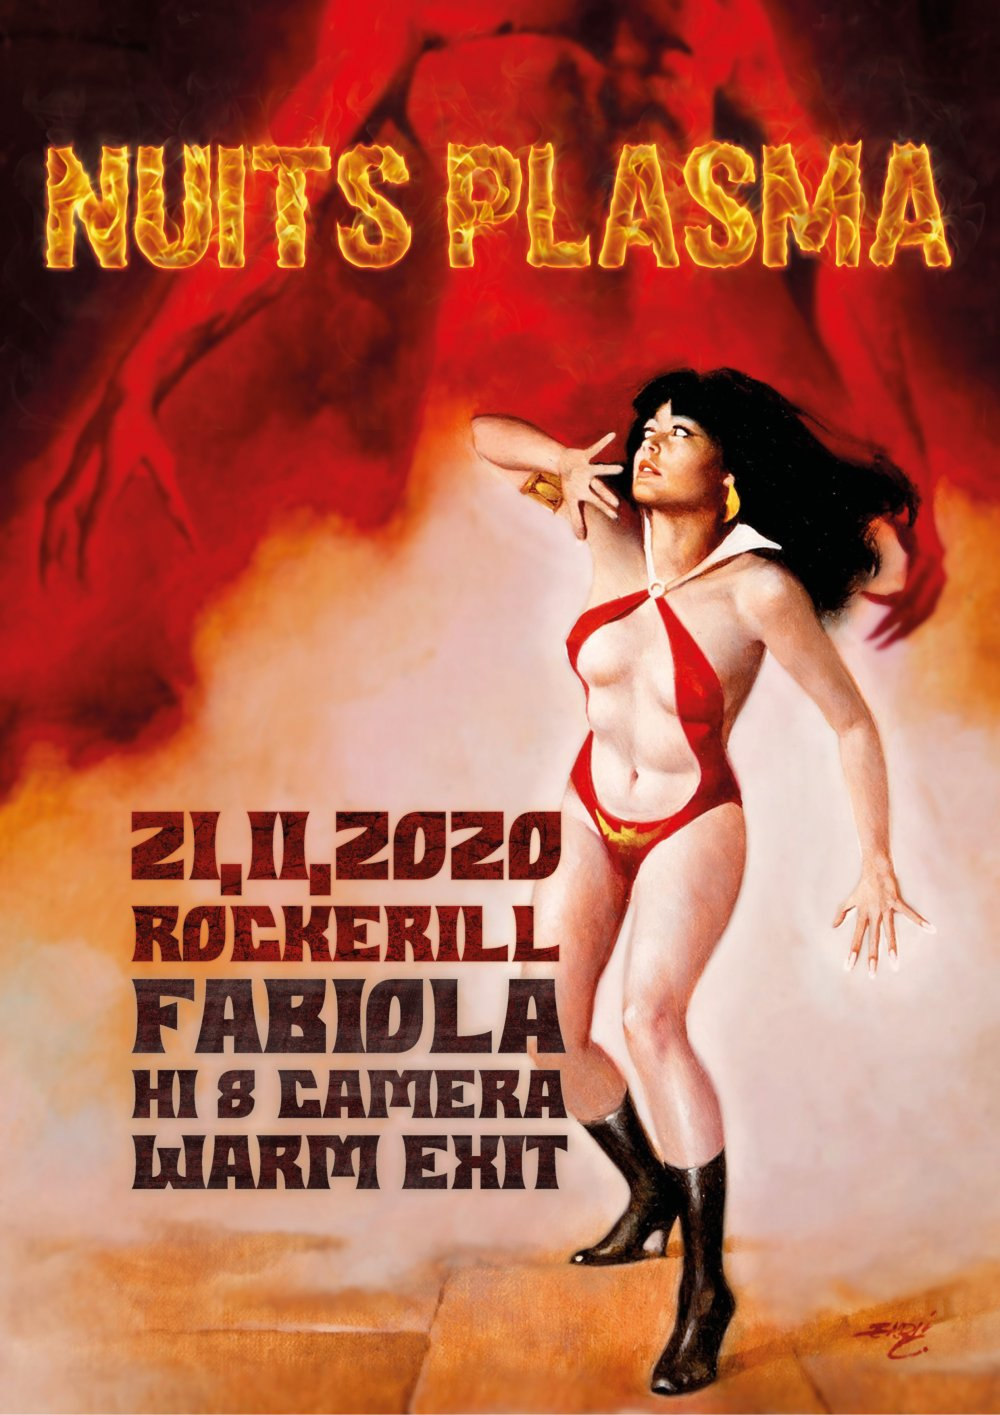 Les Nuits Plasma: Fabiola/ I H8 camera/ Warm-Exit (reporté...